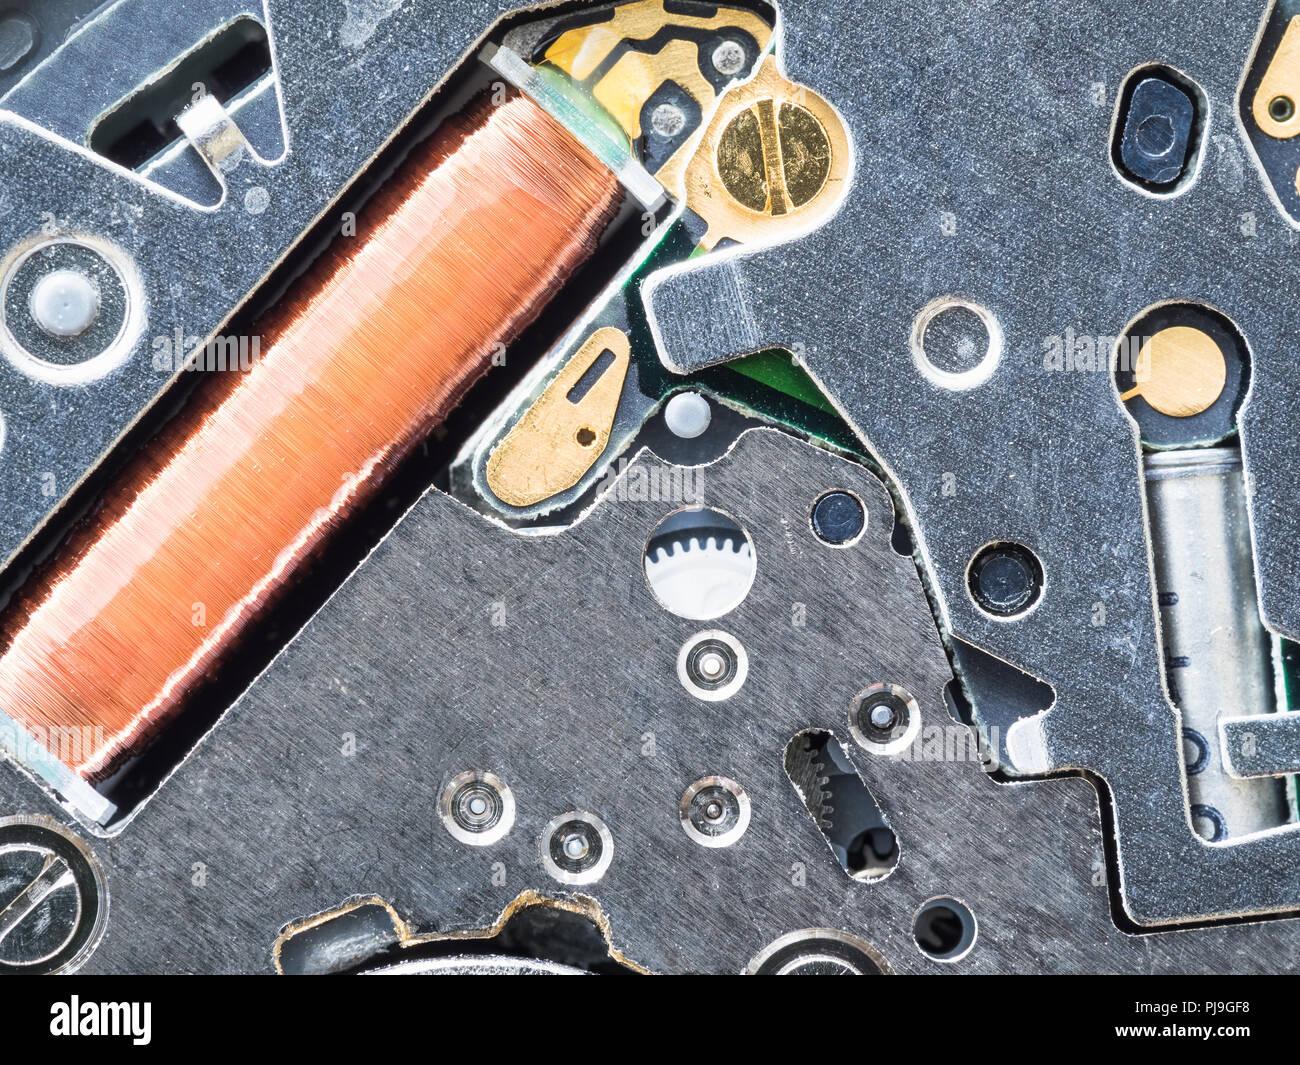 Quartz Movement Circuit Great Installation Of Wiring Diagram Clock Board In Watch Close Up Stock Photo Rh Alamy Com